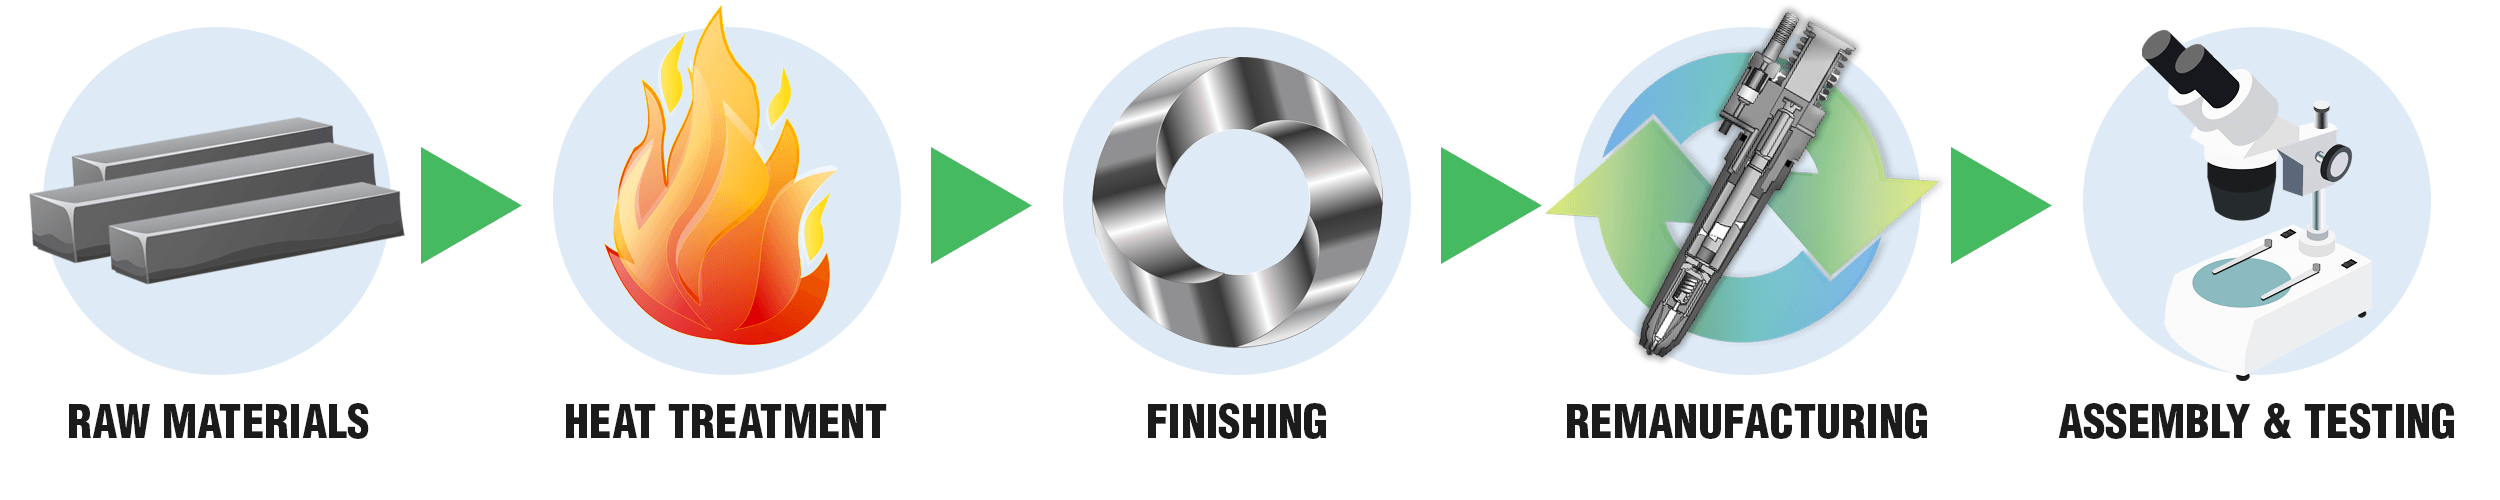 Interstate-McBee Manufacturing Process Illustration